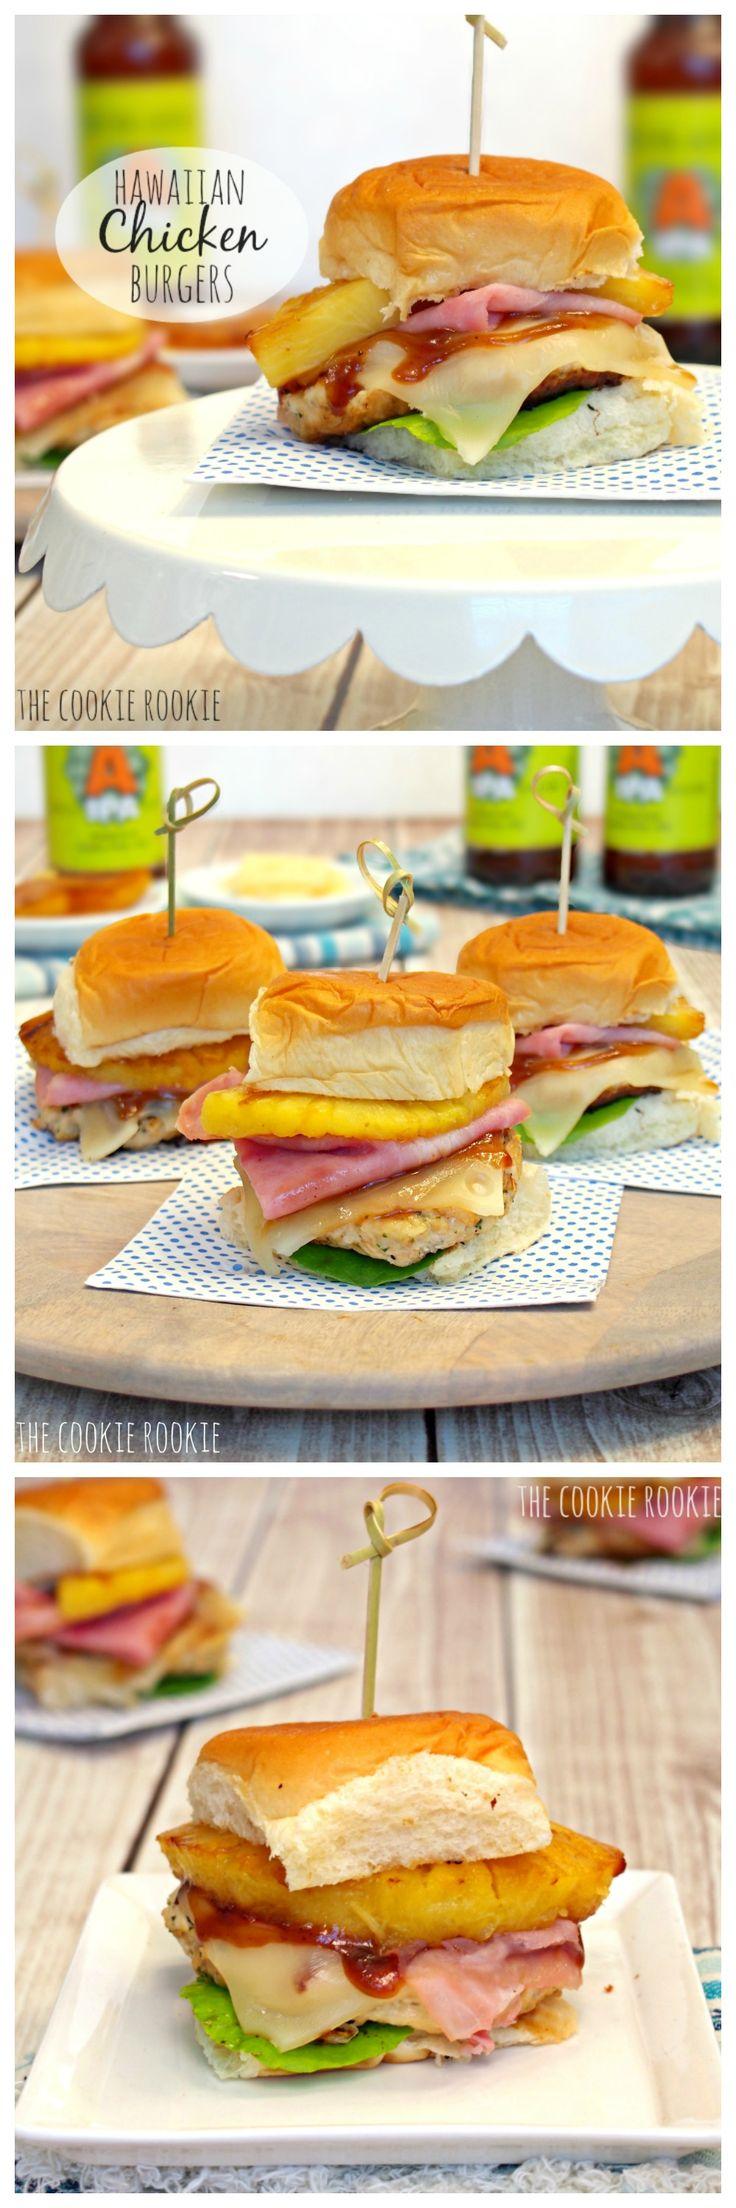 ... Hawaiian Chicken, Summer Barbecue, Yum Sliders, Chicken Burgers